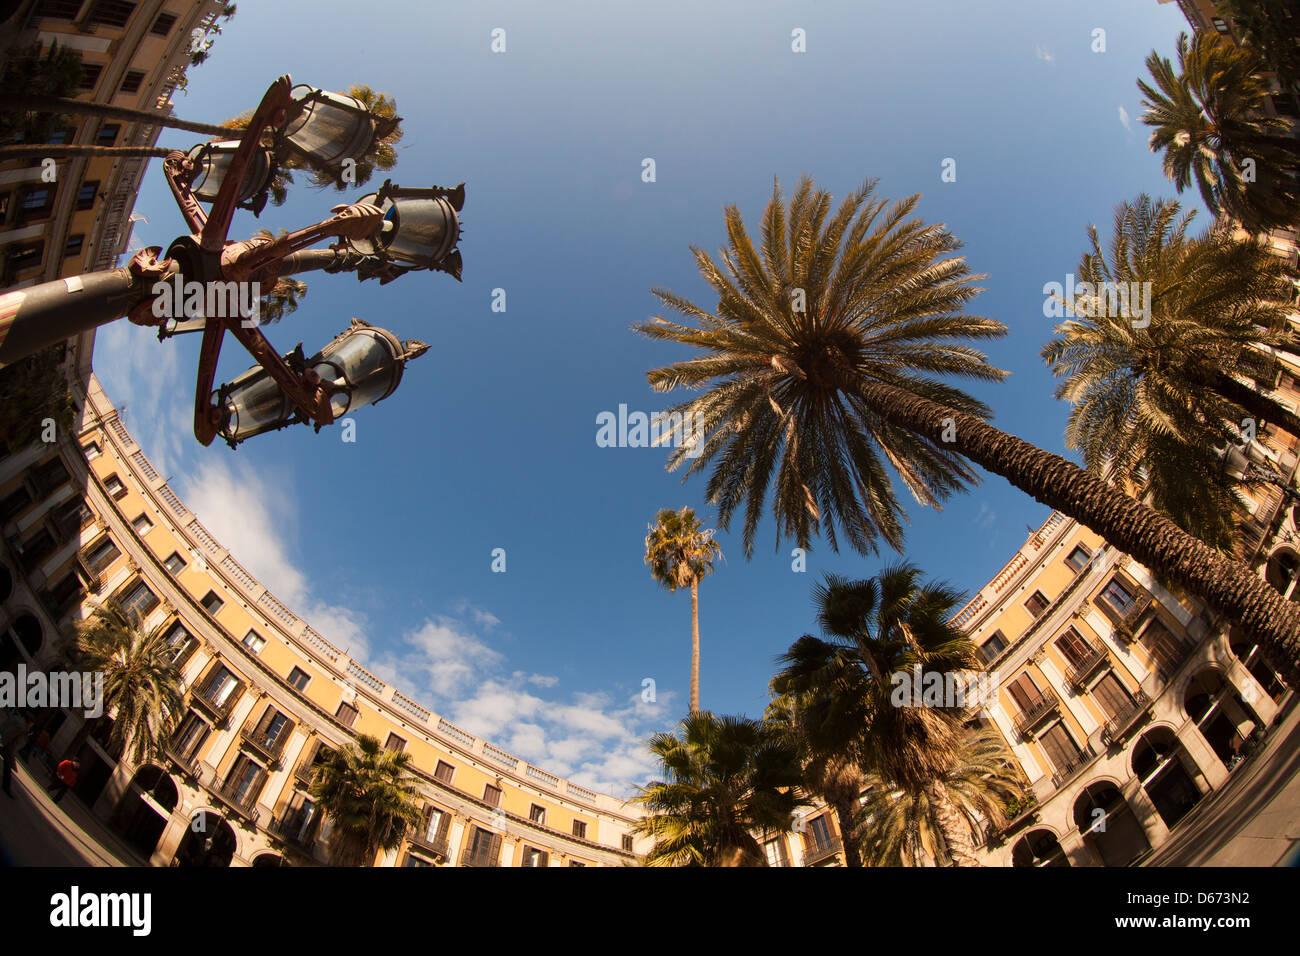 Plaça Reial - Royal Square - , Barcelona, Spain - Stock Image